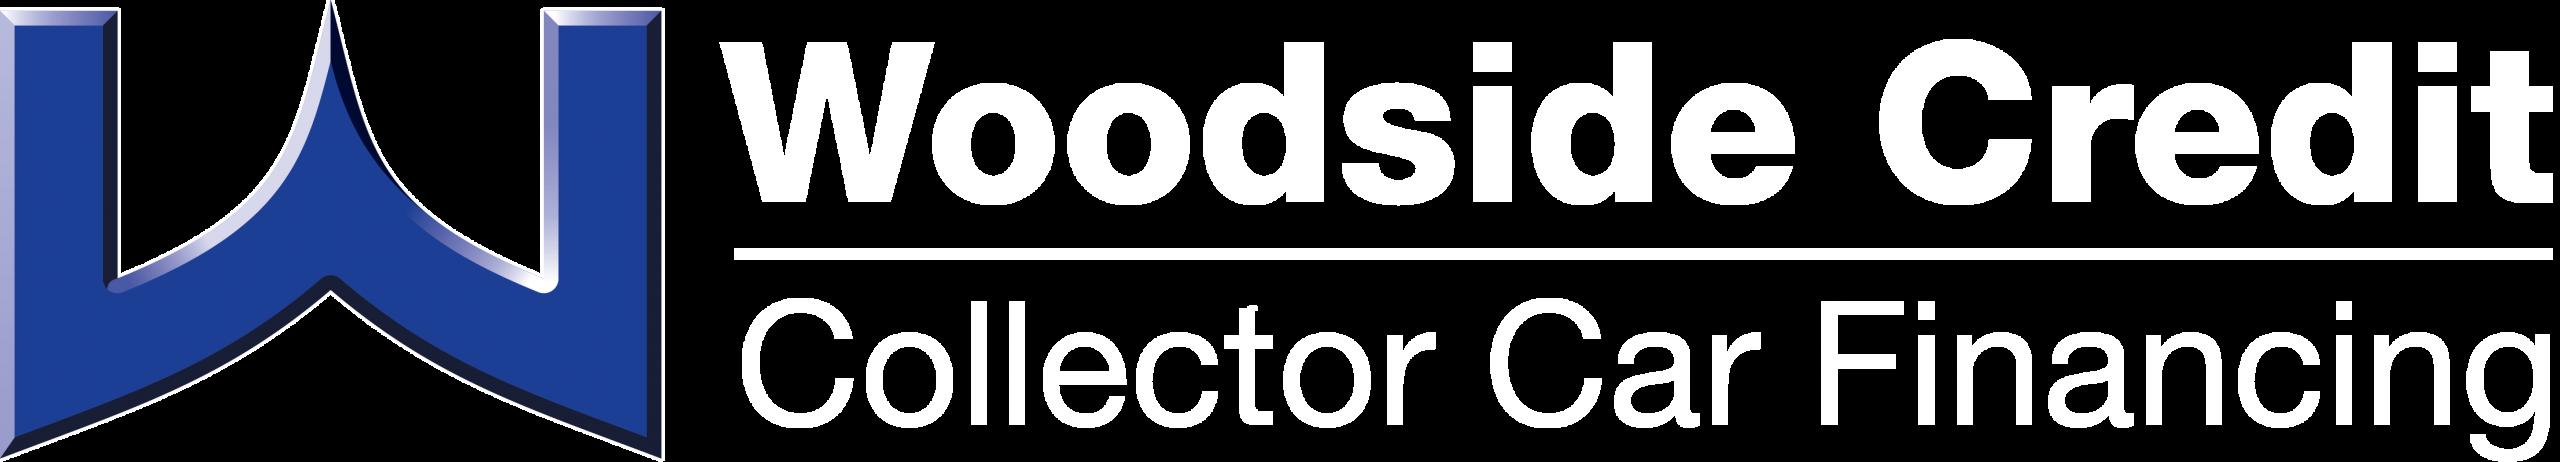 Woodside-Credit-Logo-White